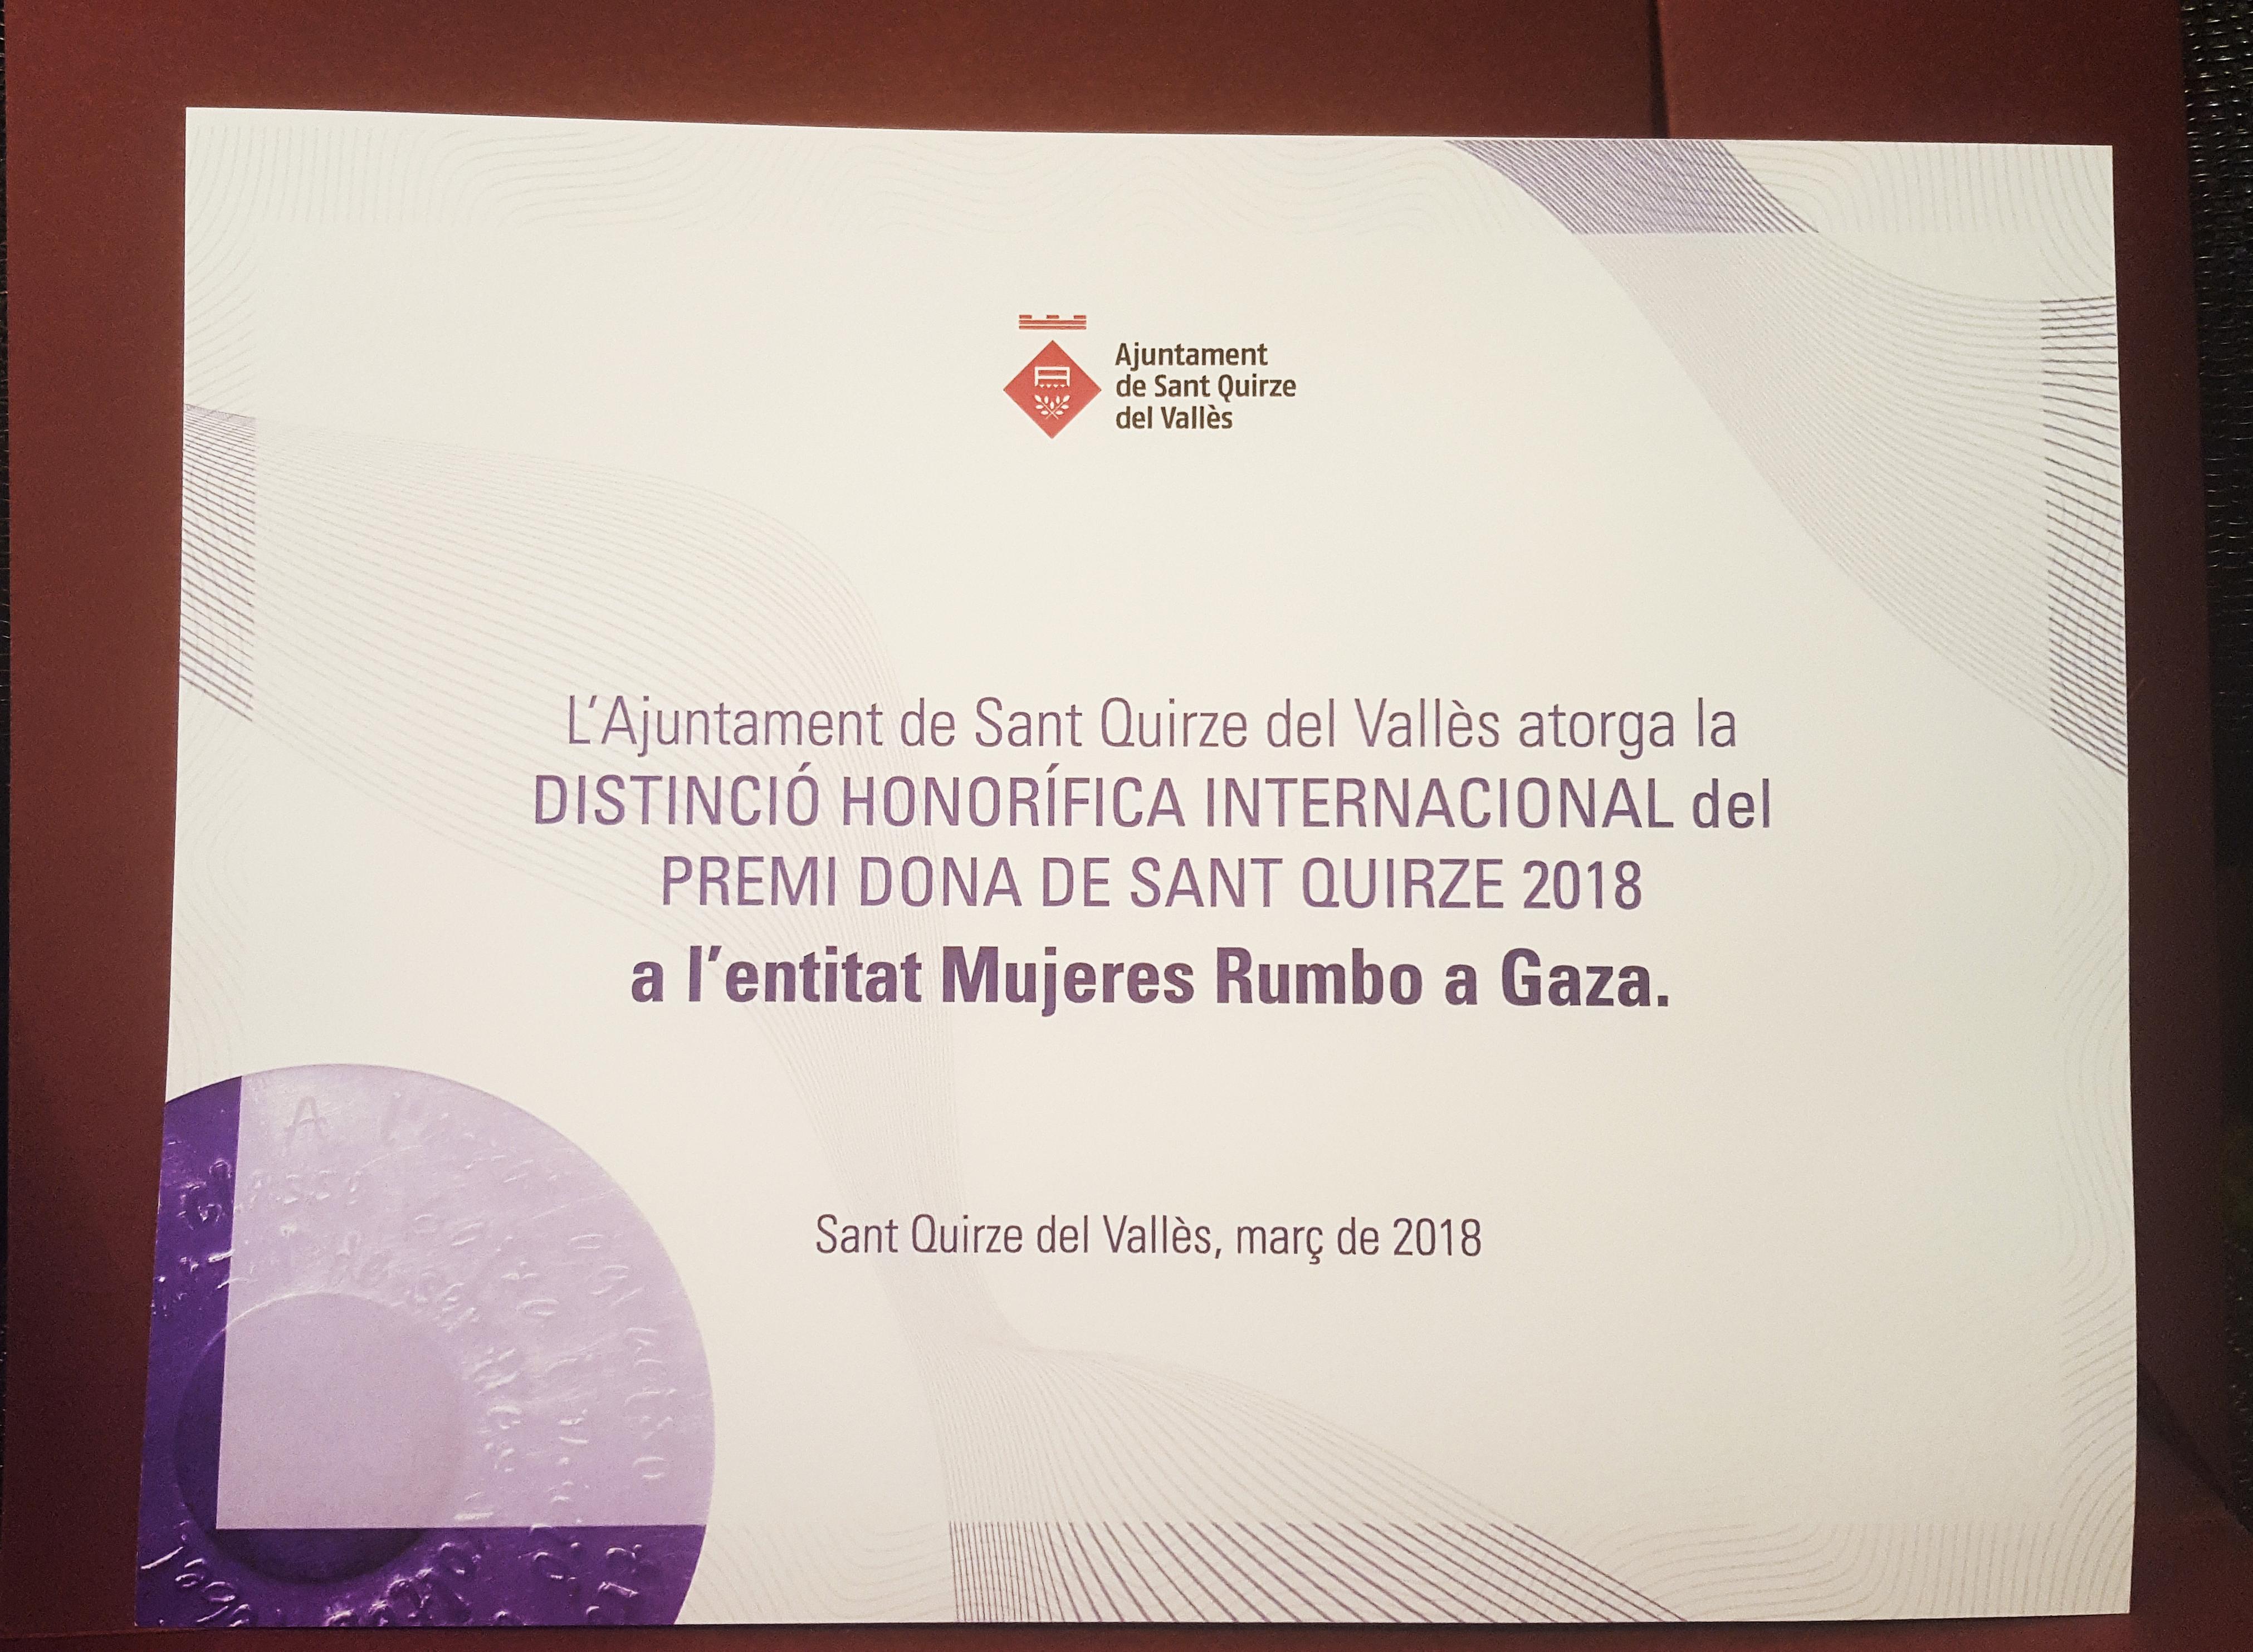 Mujeres Rumbo a Gaza, Premi Dona Internacional Sant Quirze 2018